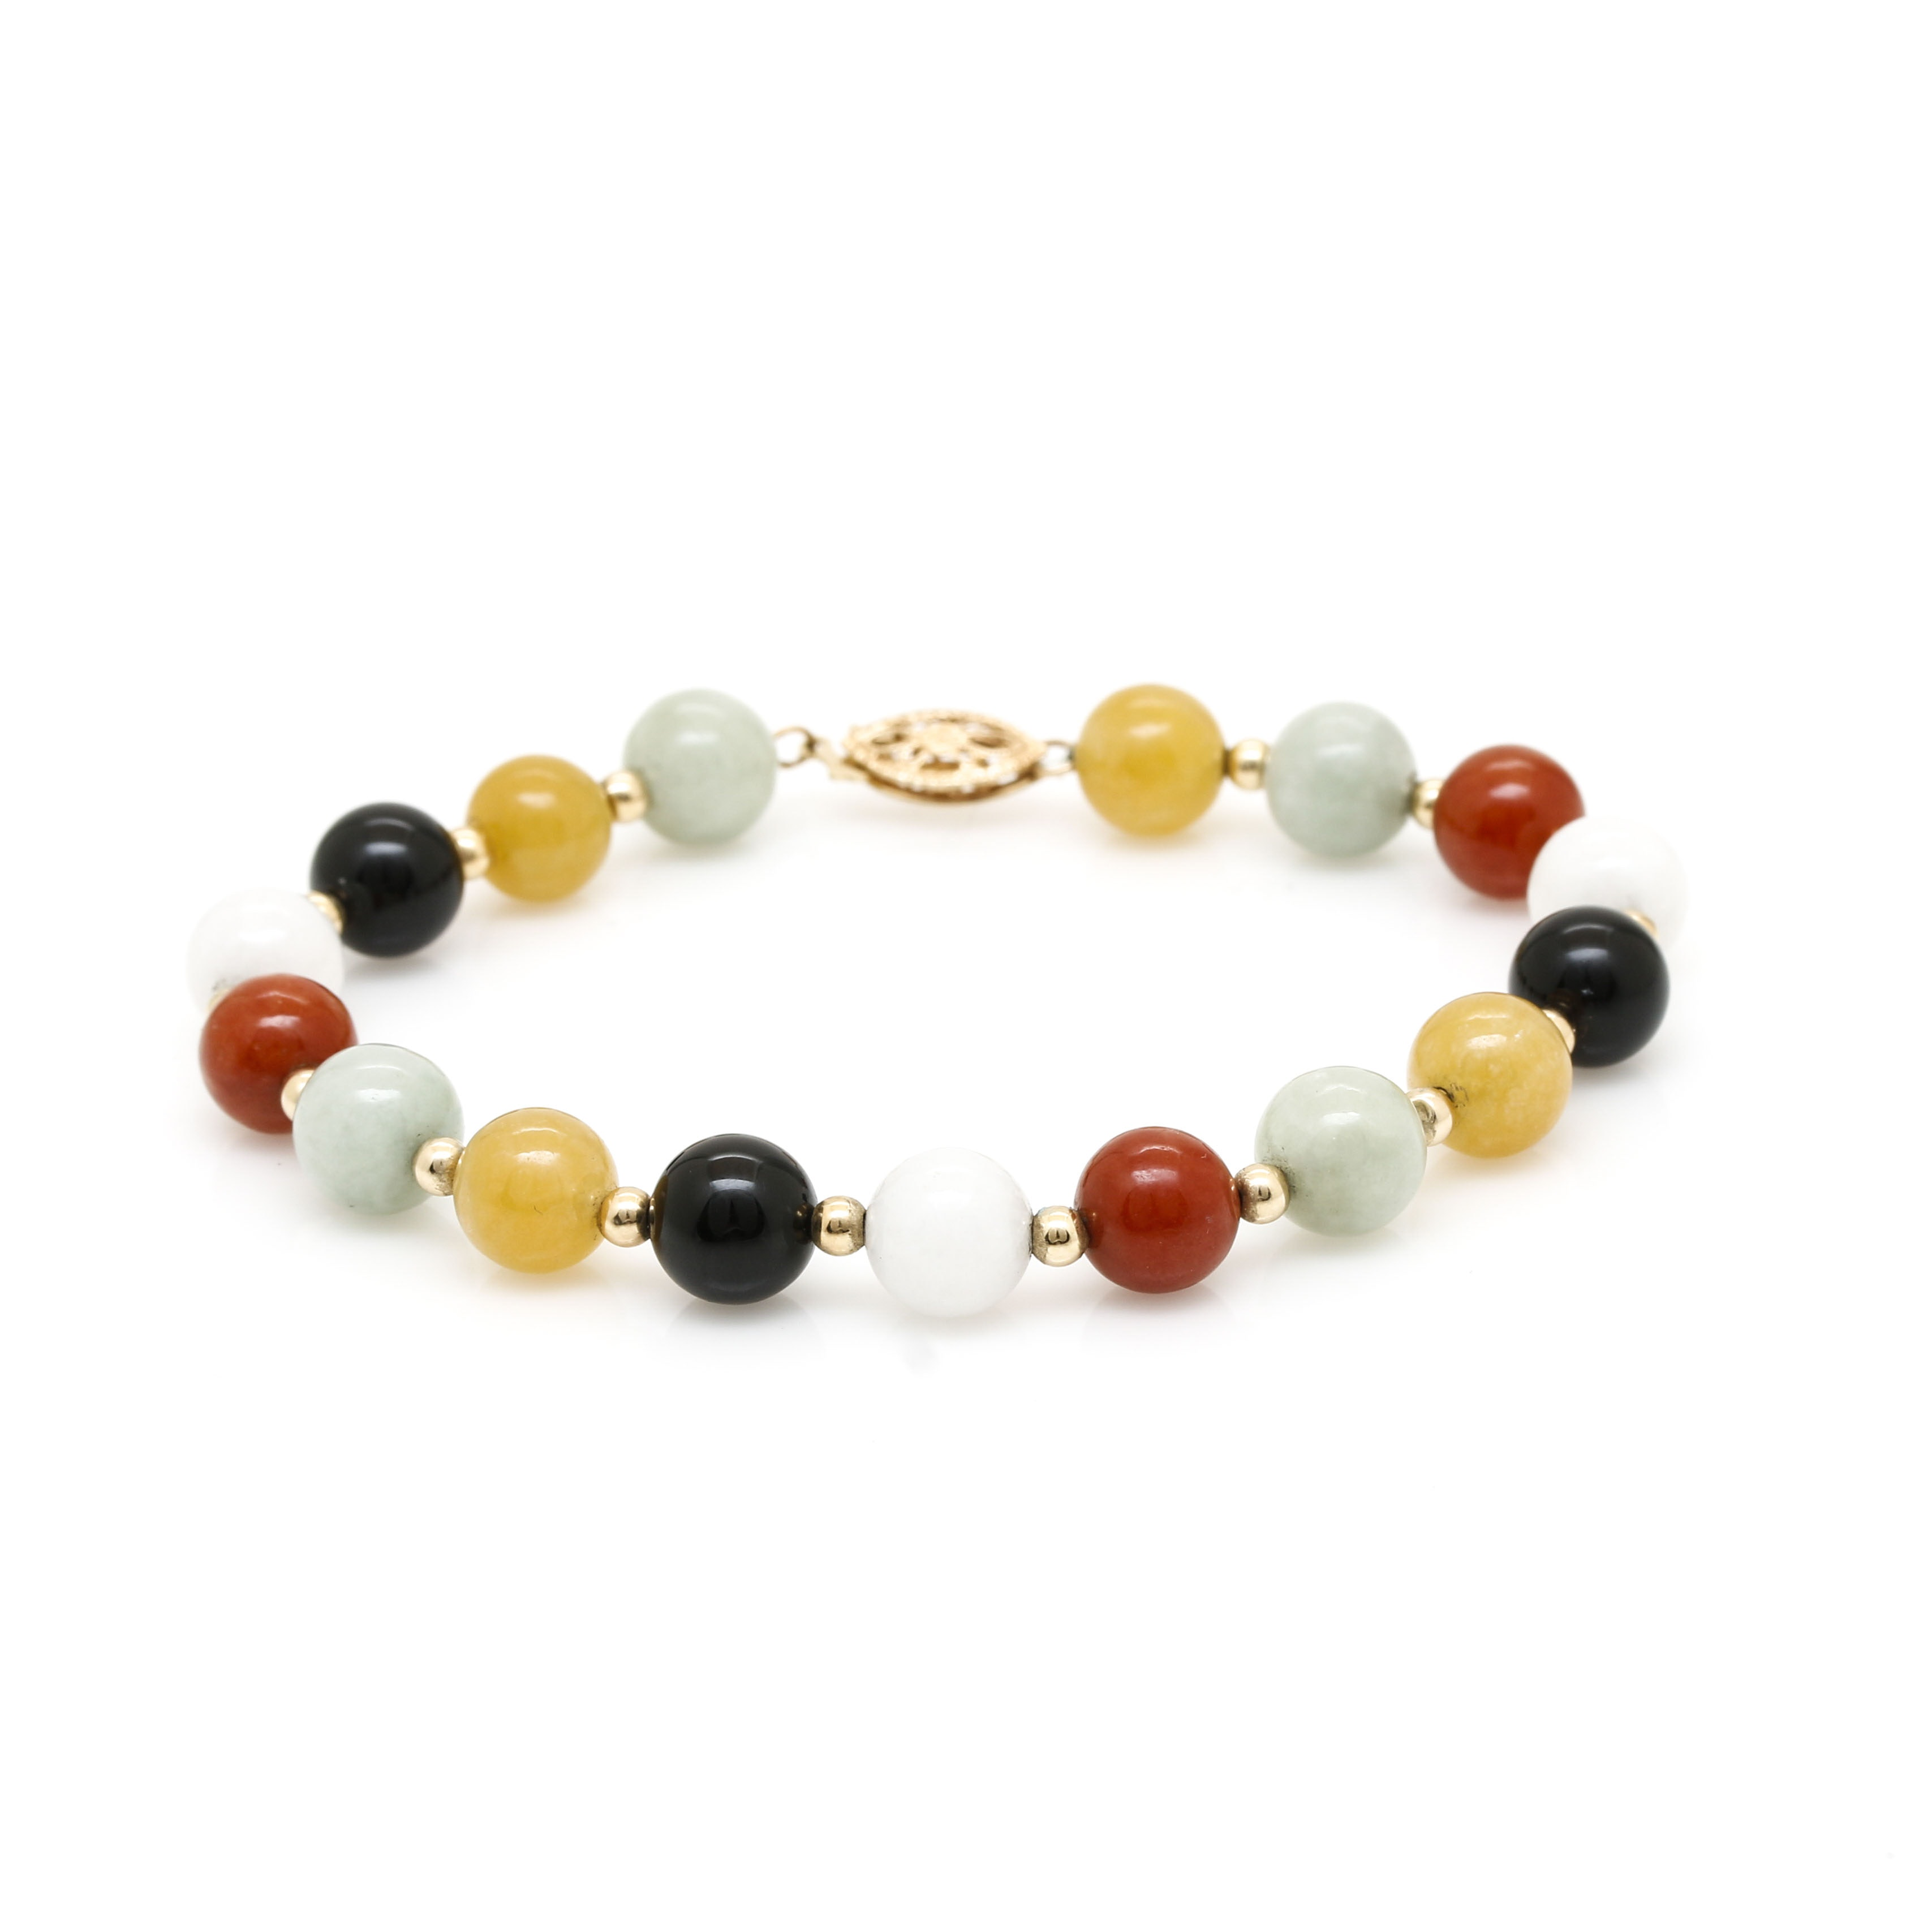 14K Yellow Gold Onyx and Jadeite Beaded Bracelet